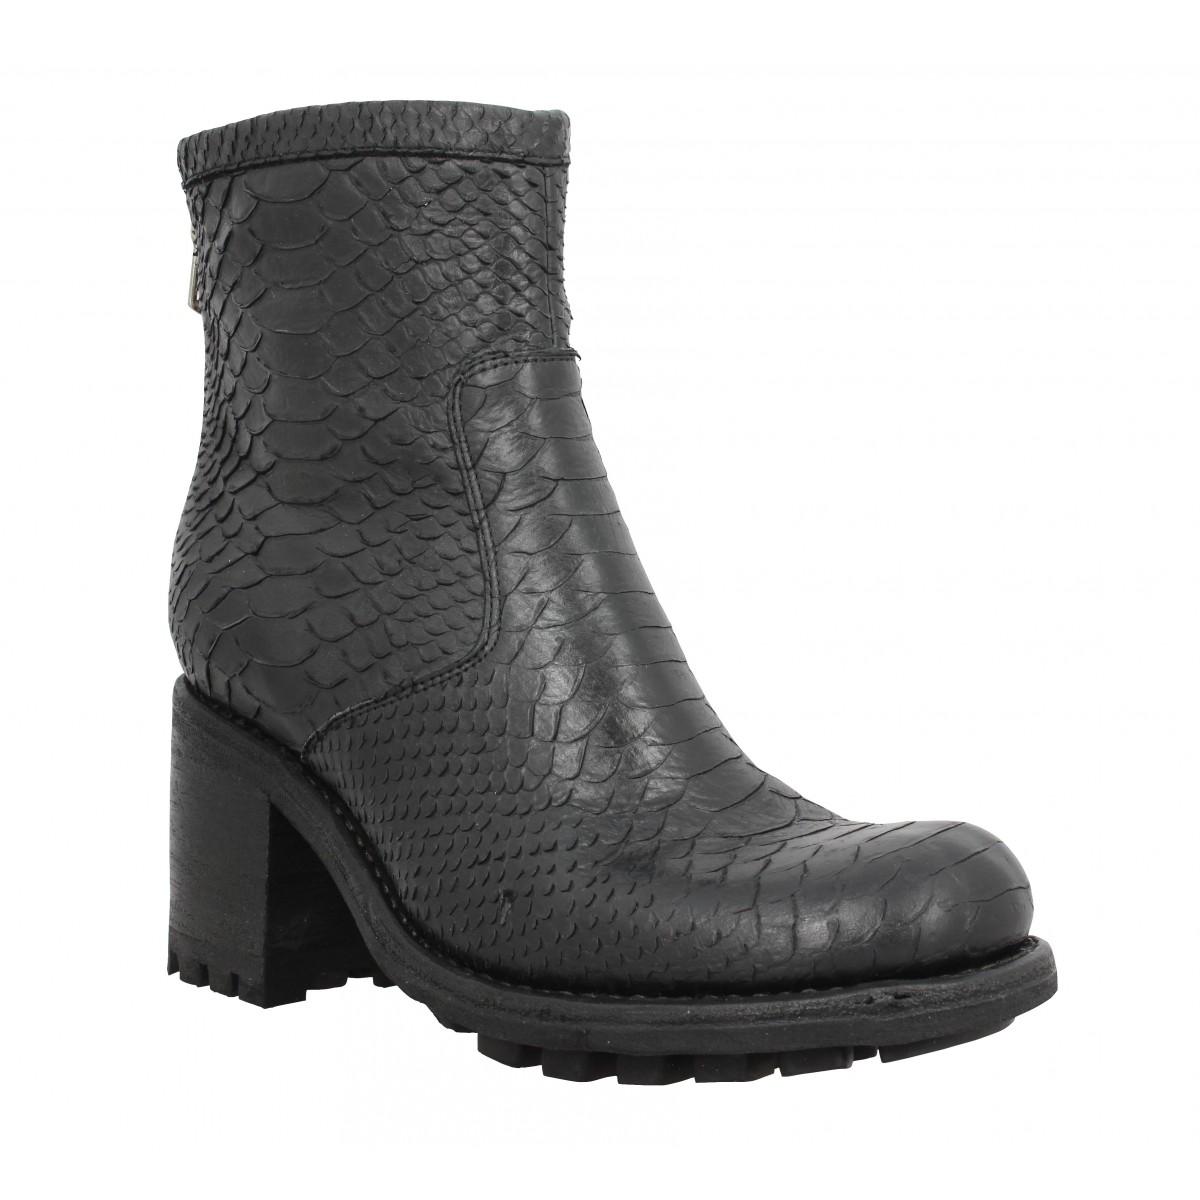 Bottines FREE LANCE Justy 7 Back Zip Boot diamente wash Femme Noir